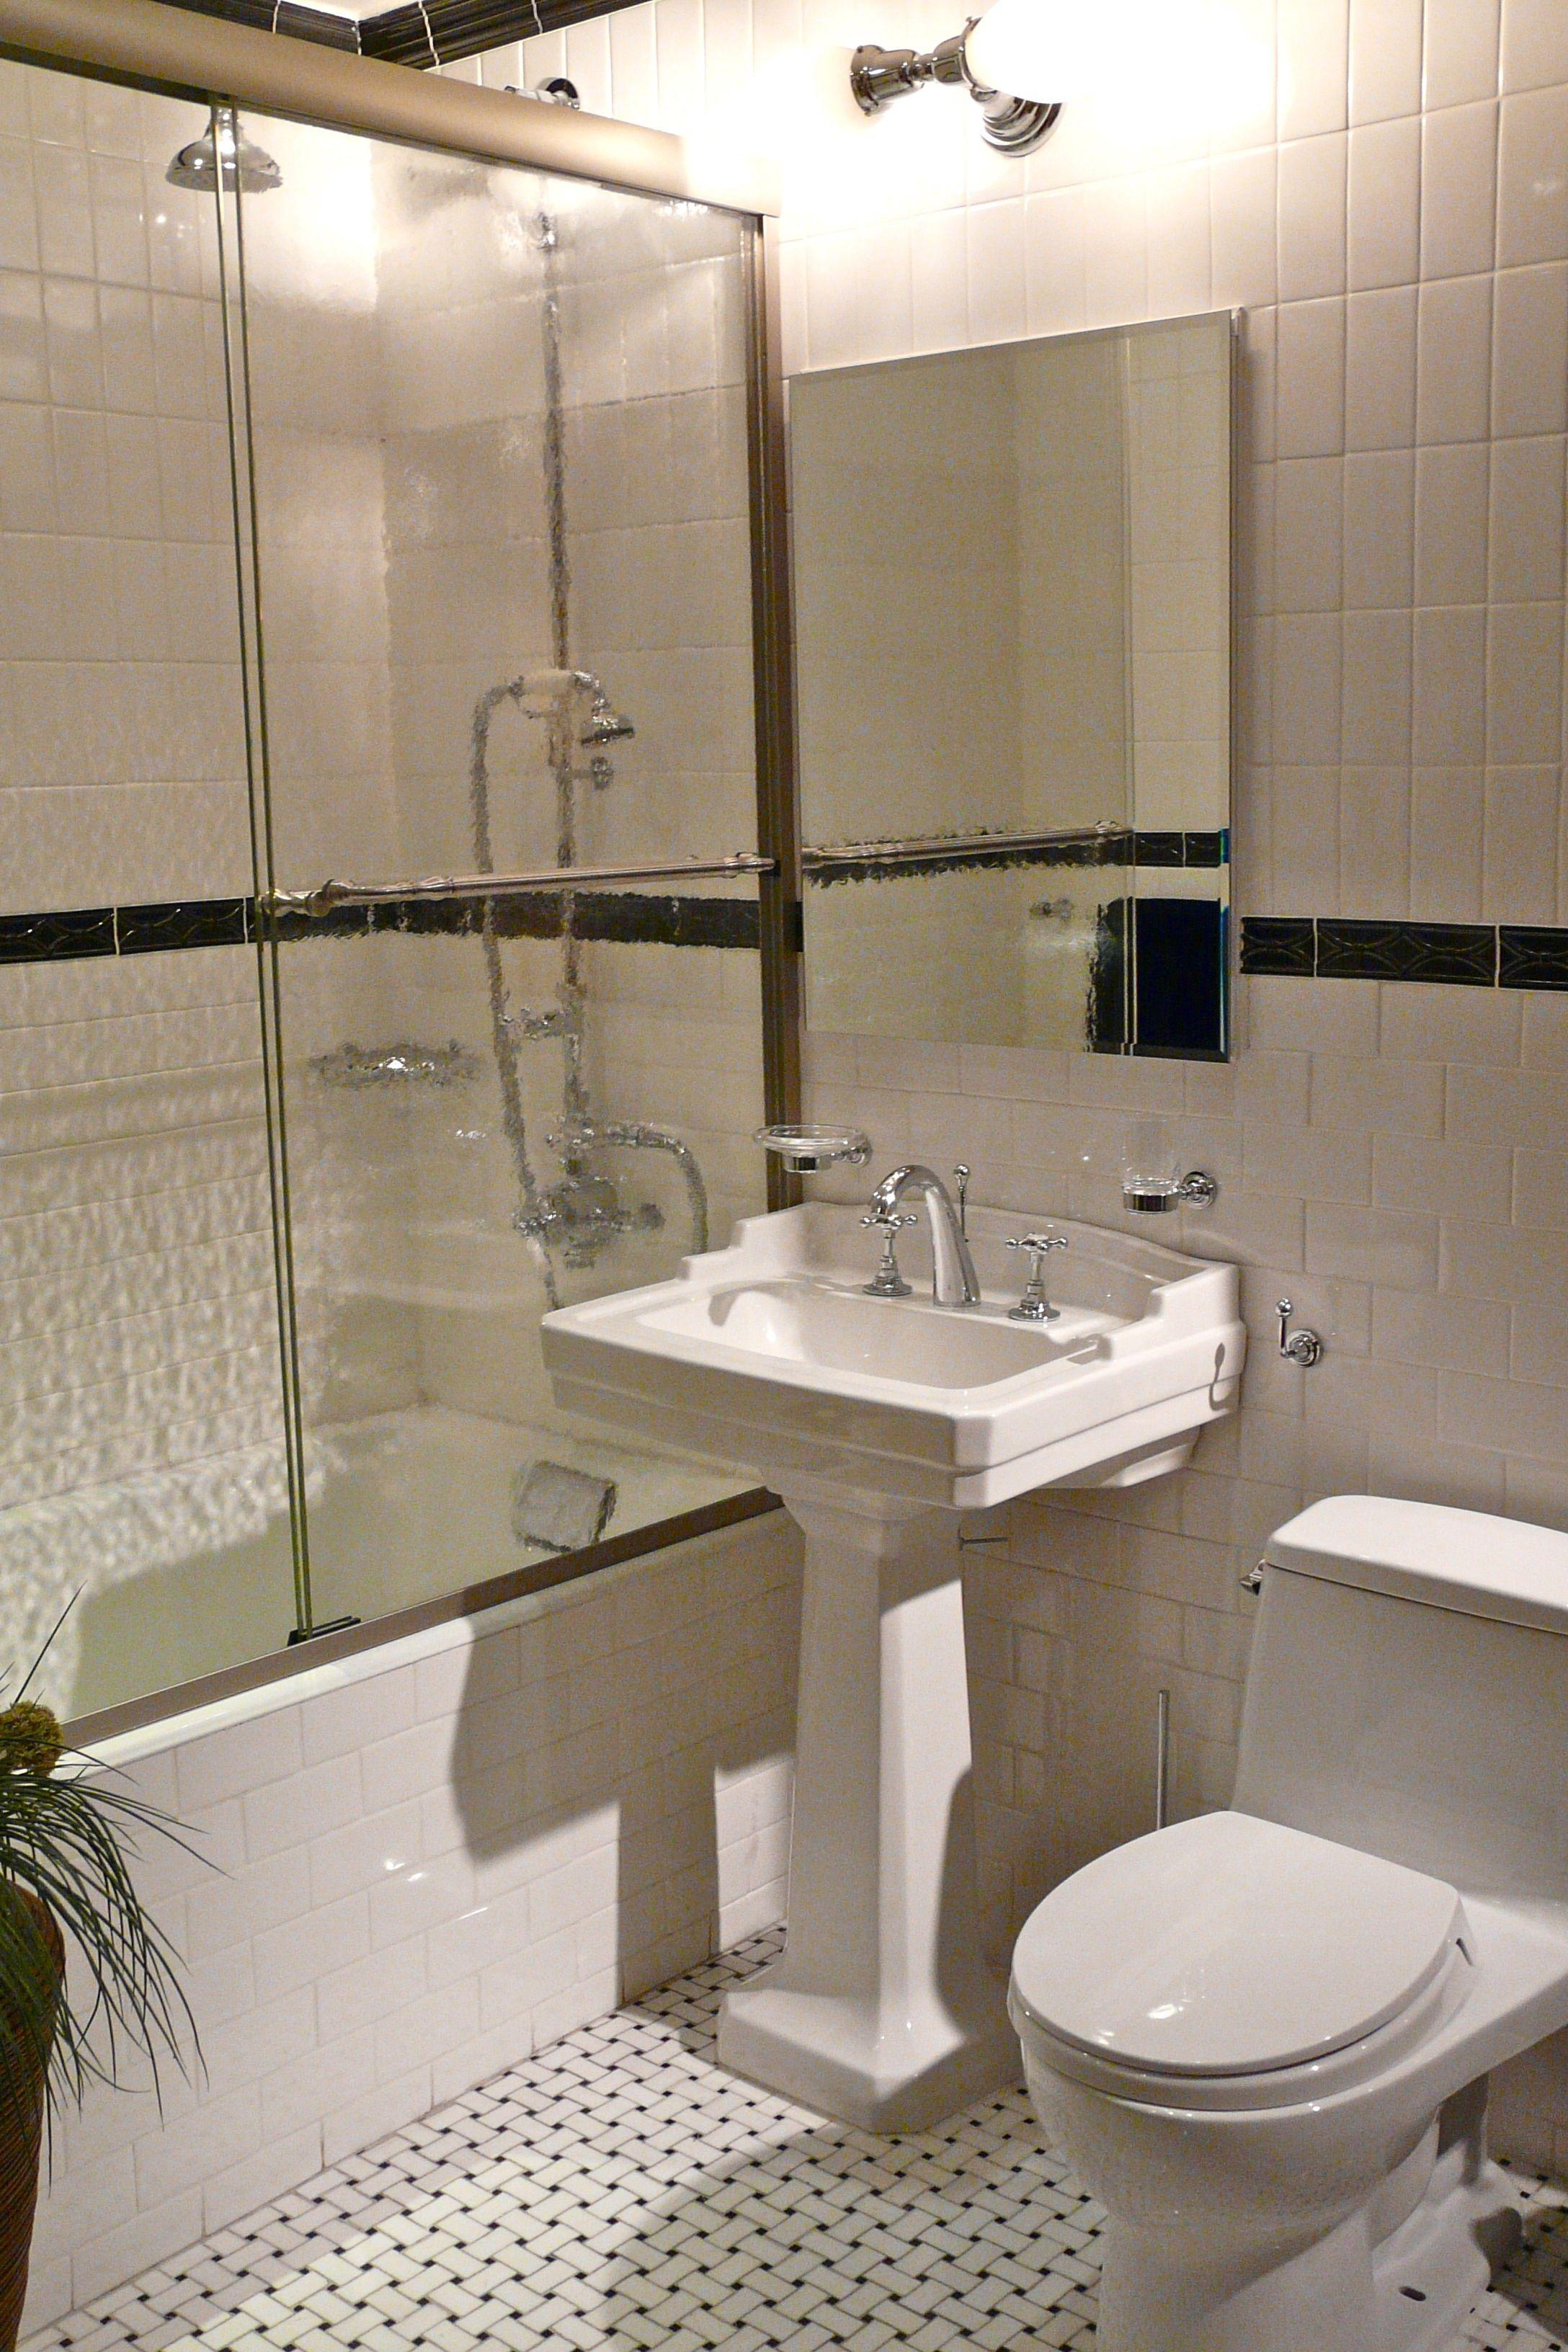 Minimalist Bedroom : Denver Bathroom Remodel Denver Bathroom Design Bathroom  Flooring Intended For Small Bathroom Remodeled Minimalist Bedroom Design  Design ...